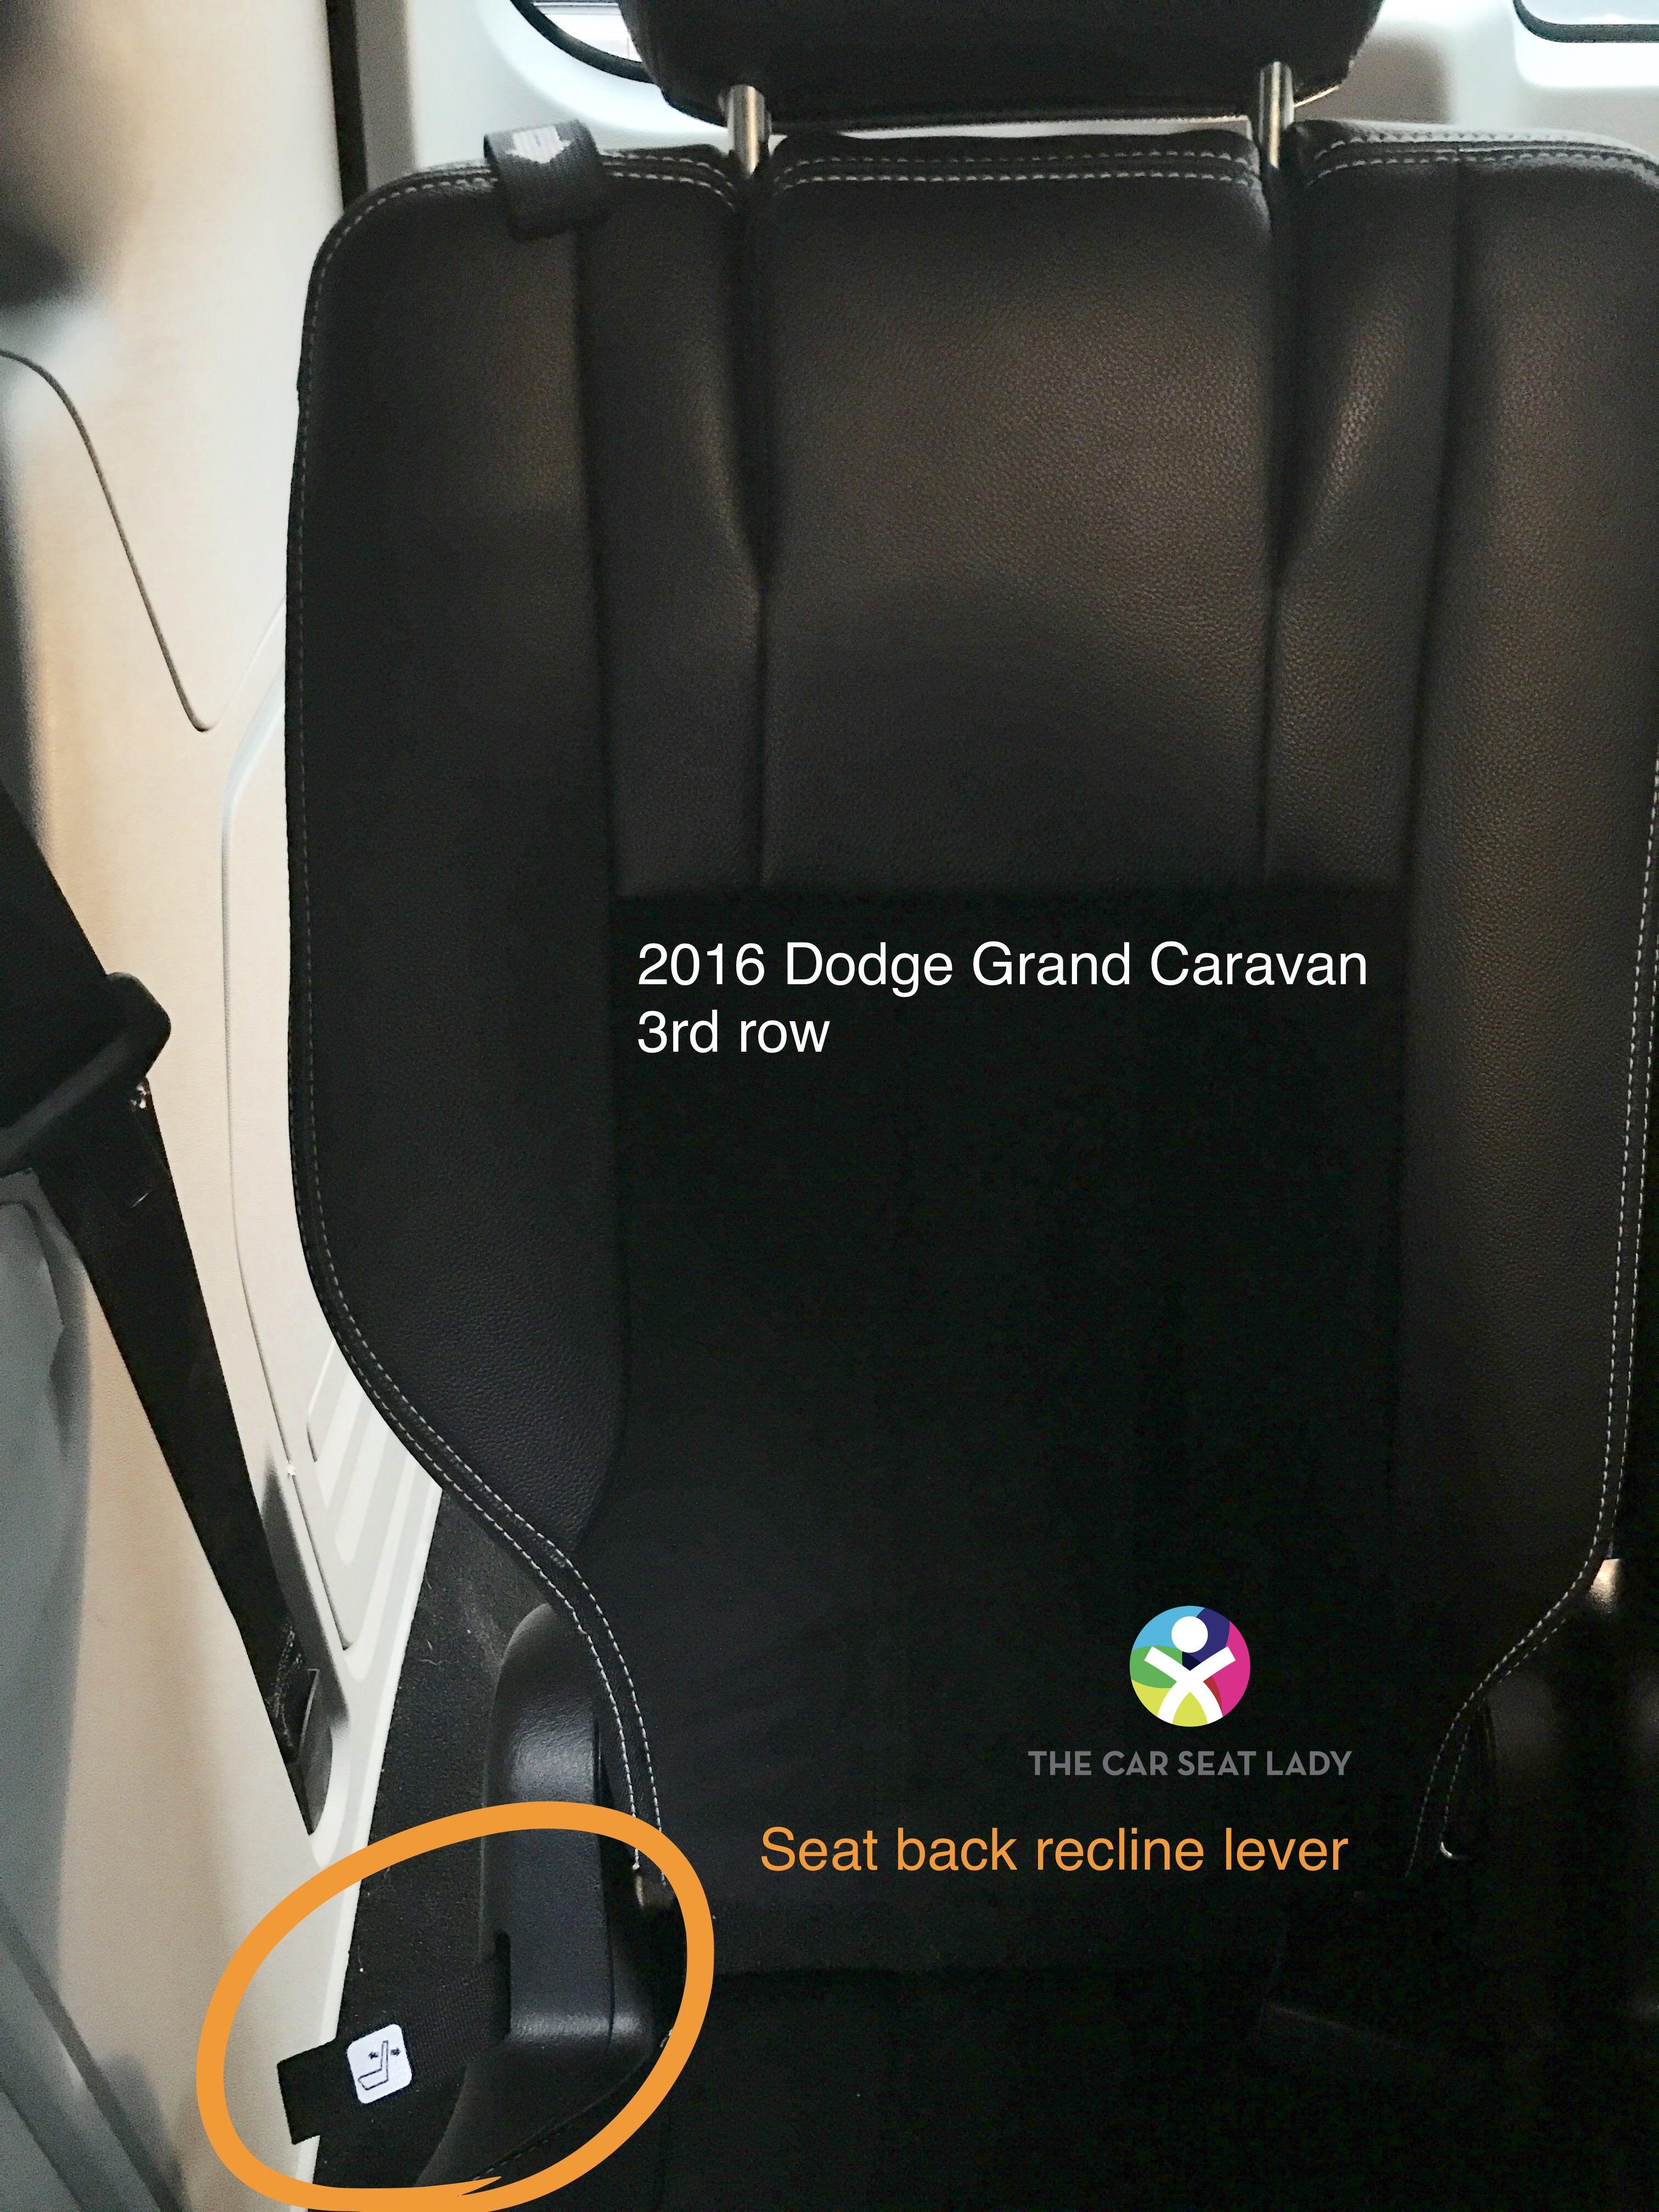 The Car Seat LadyDodge Grand Caravan - The Car Seat Lady